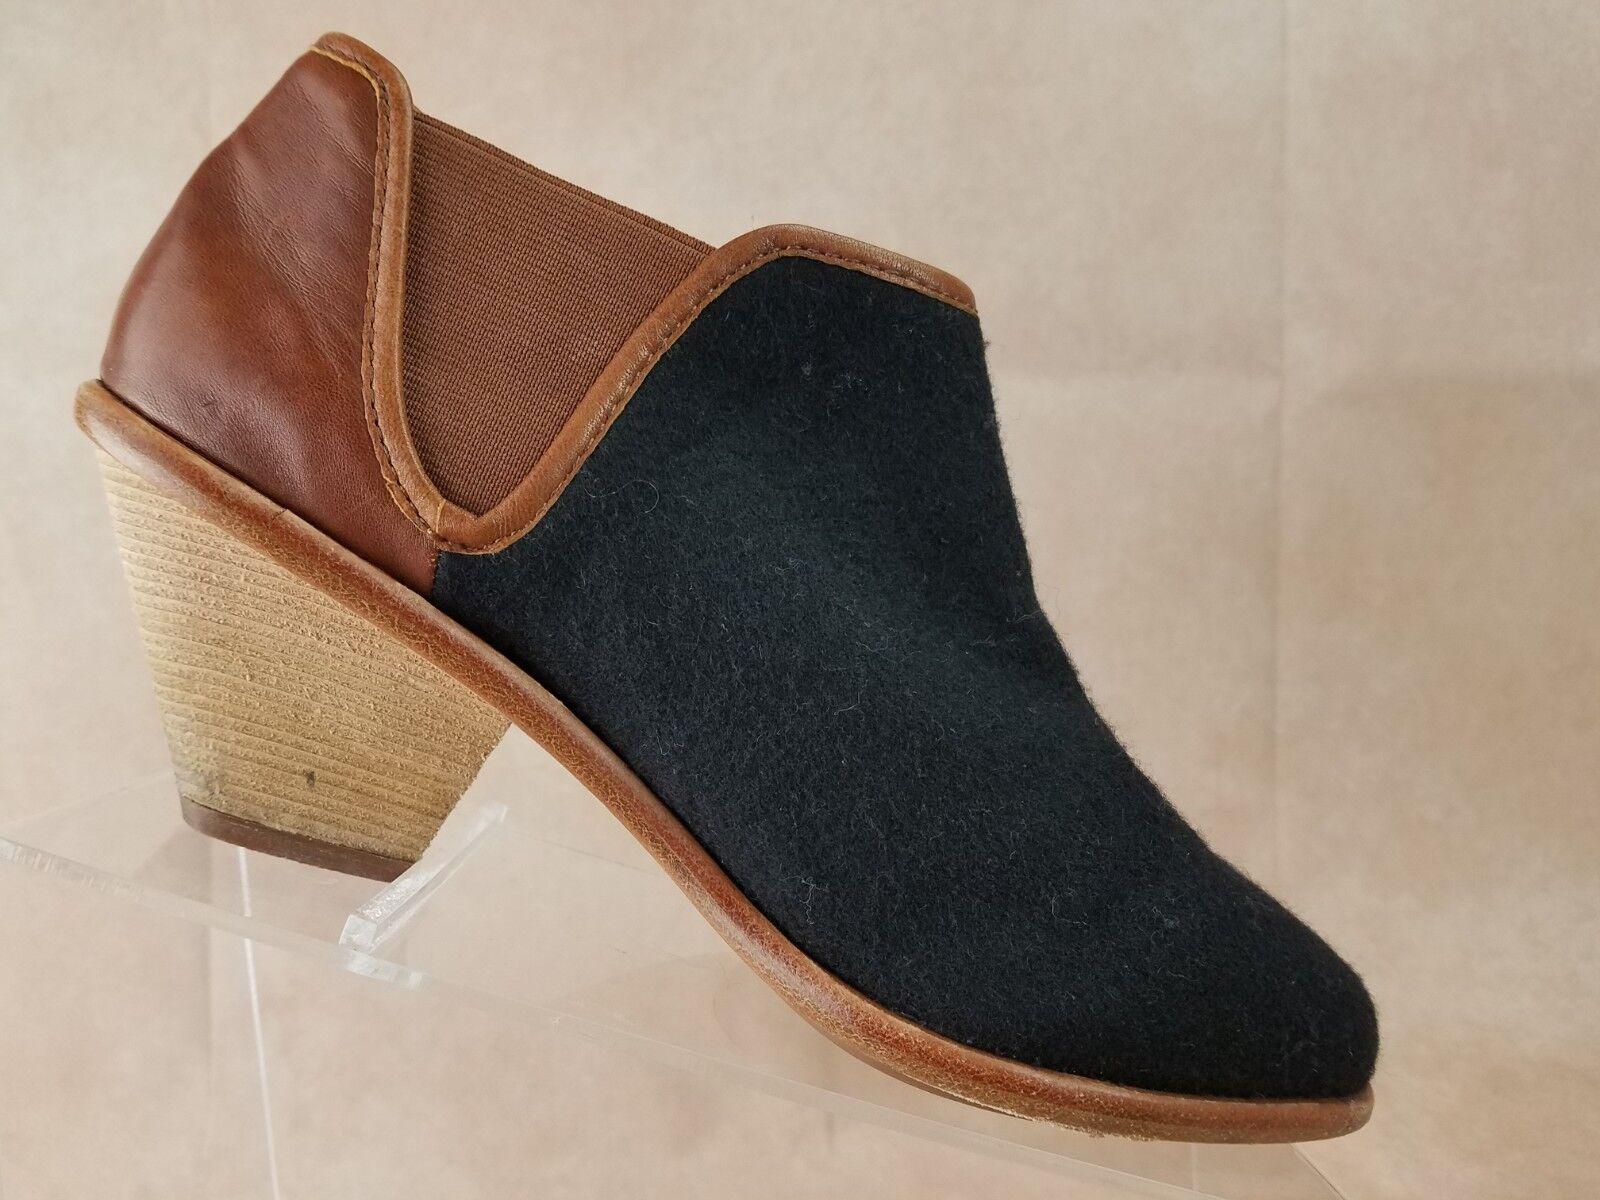 Matt Bernson Womens Ankle Boot Size 8 Black Brown Leather Elastic Anthropologie